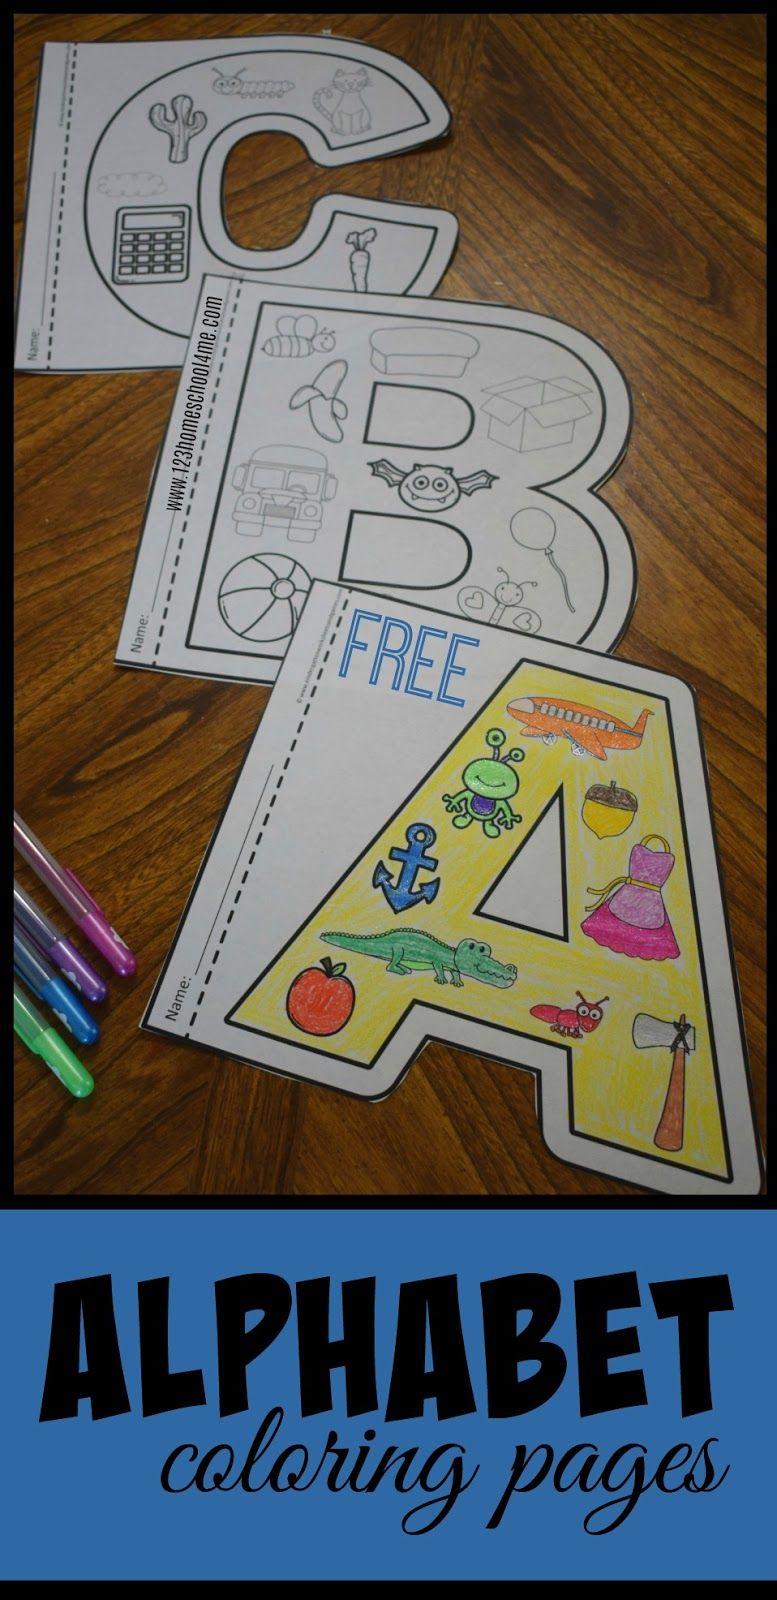 Alphabet Coloring Pages Preschool activities, Alphabet